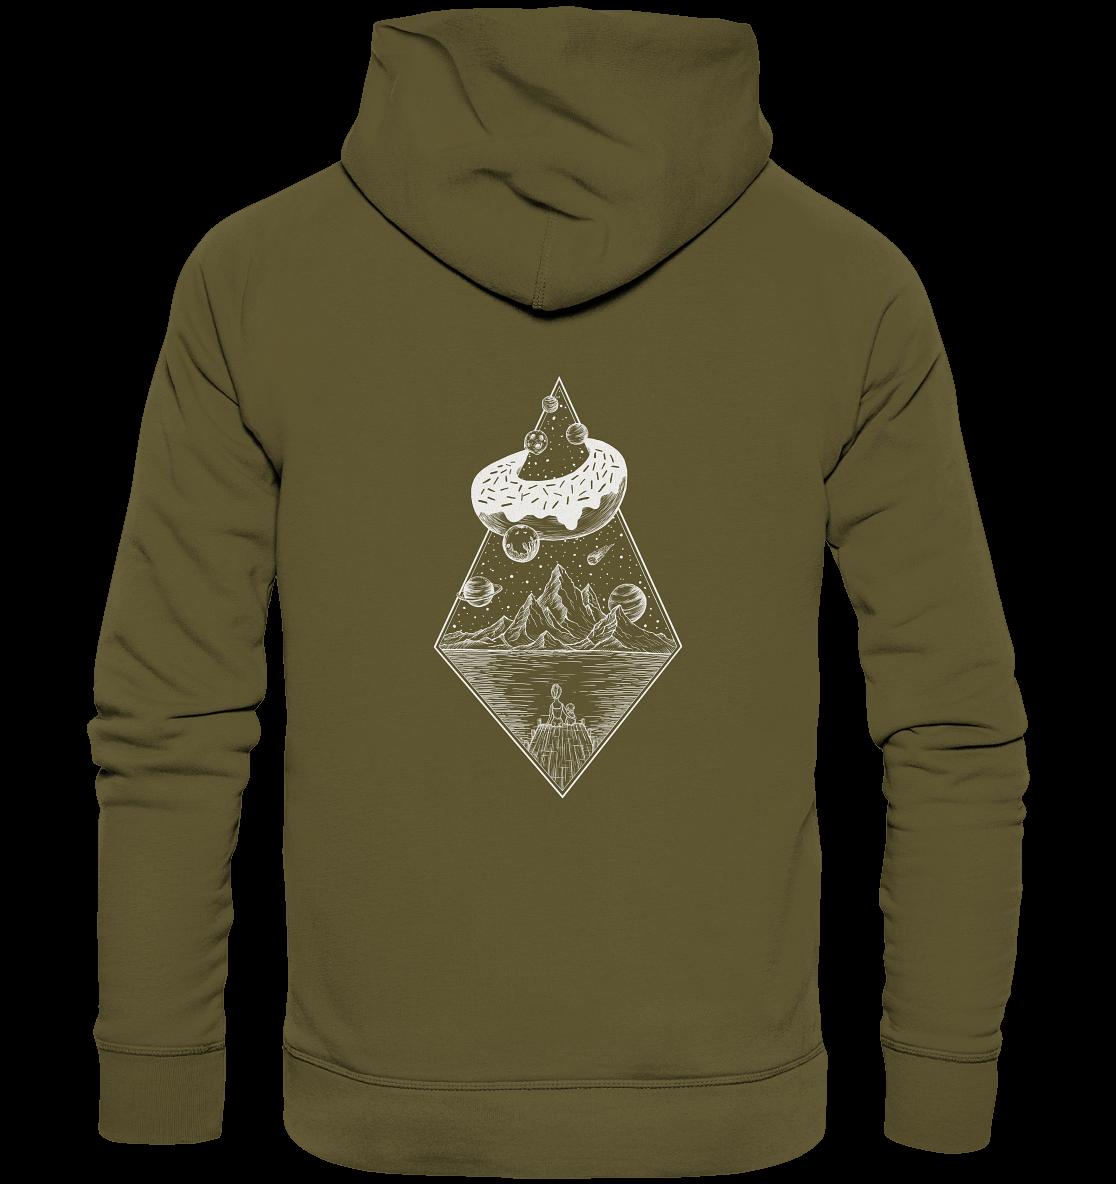 back-organic-hoodie-5e5530-1116x.png